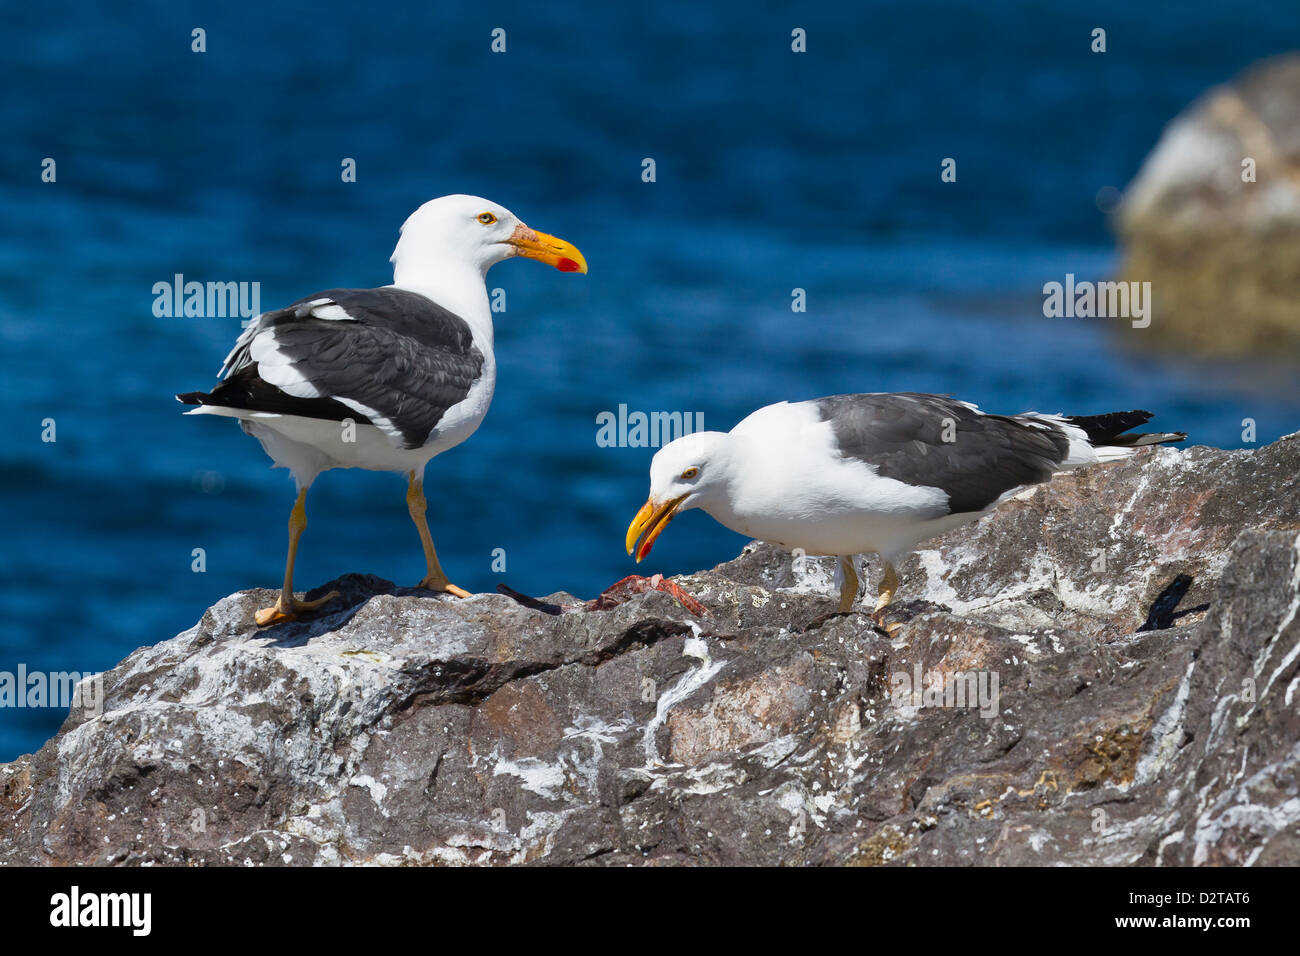 Yellow-footed gulls (Larus livens), Gulf of California (Sea of Cortez), Baja California Sur, Mexico, North America - Stock Image